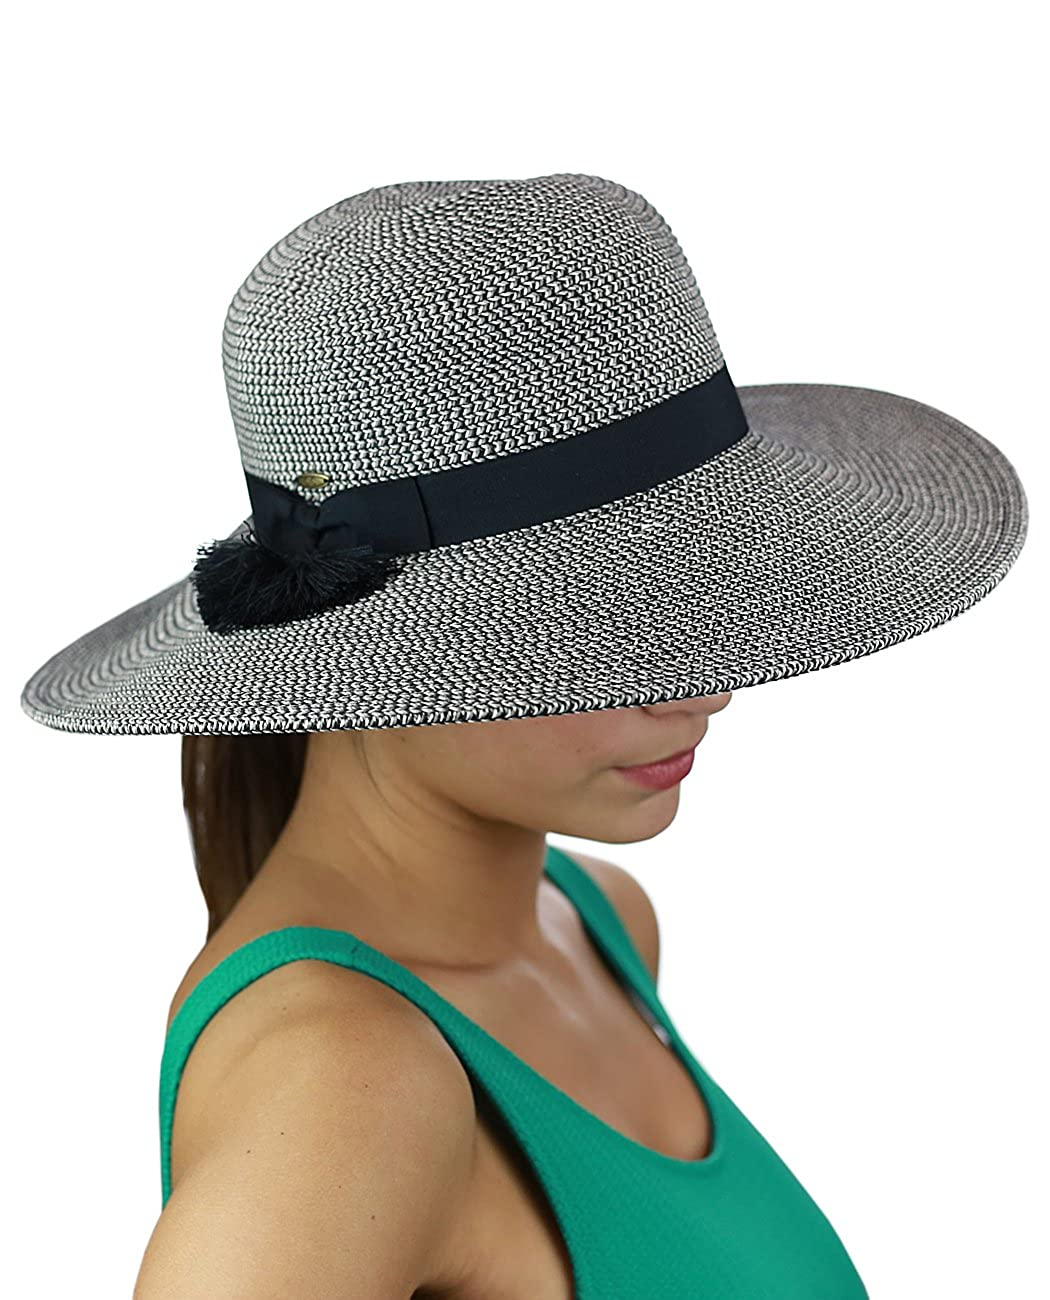 C.C Women's Solid Color Band with Tassel Summer Beach Floppy Brim Sun Hat Black ST505-BK